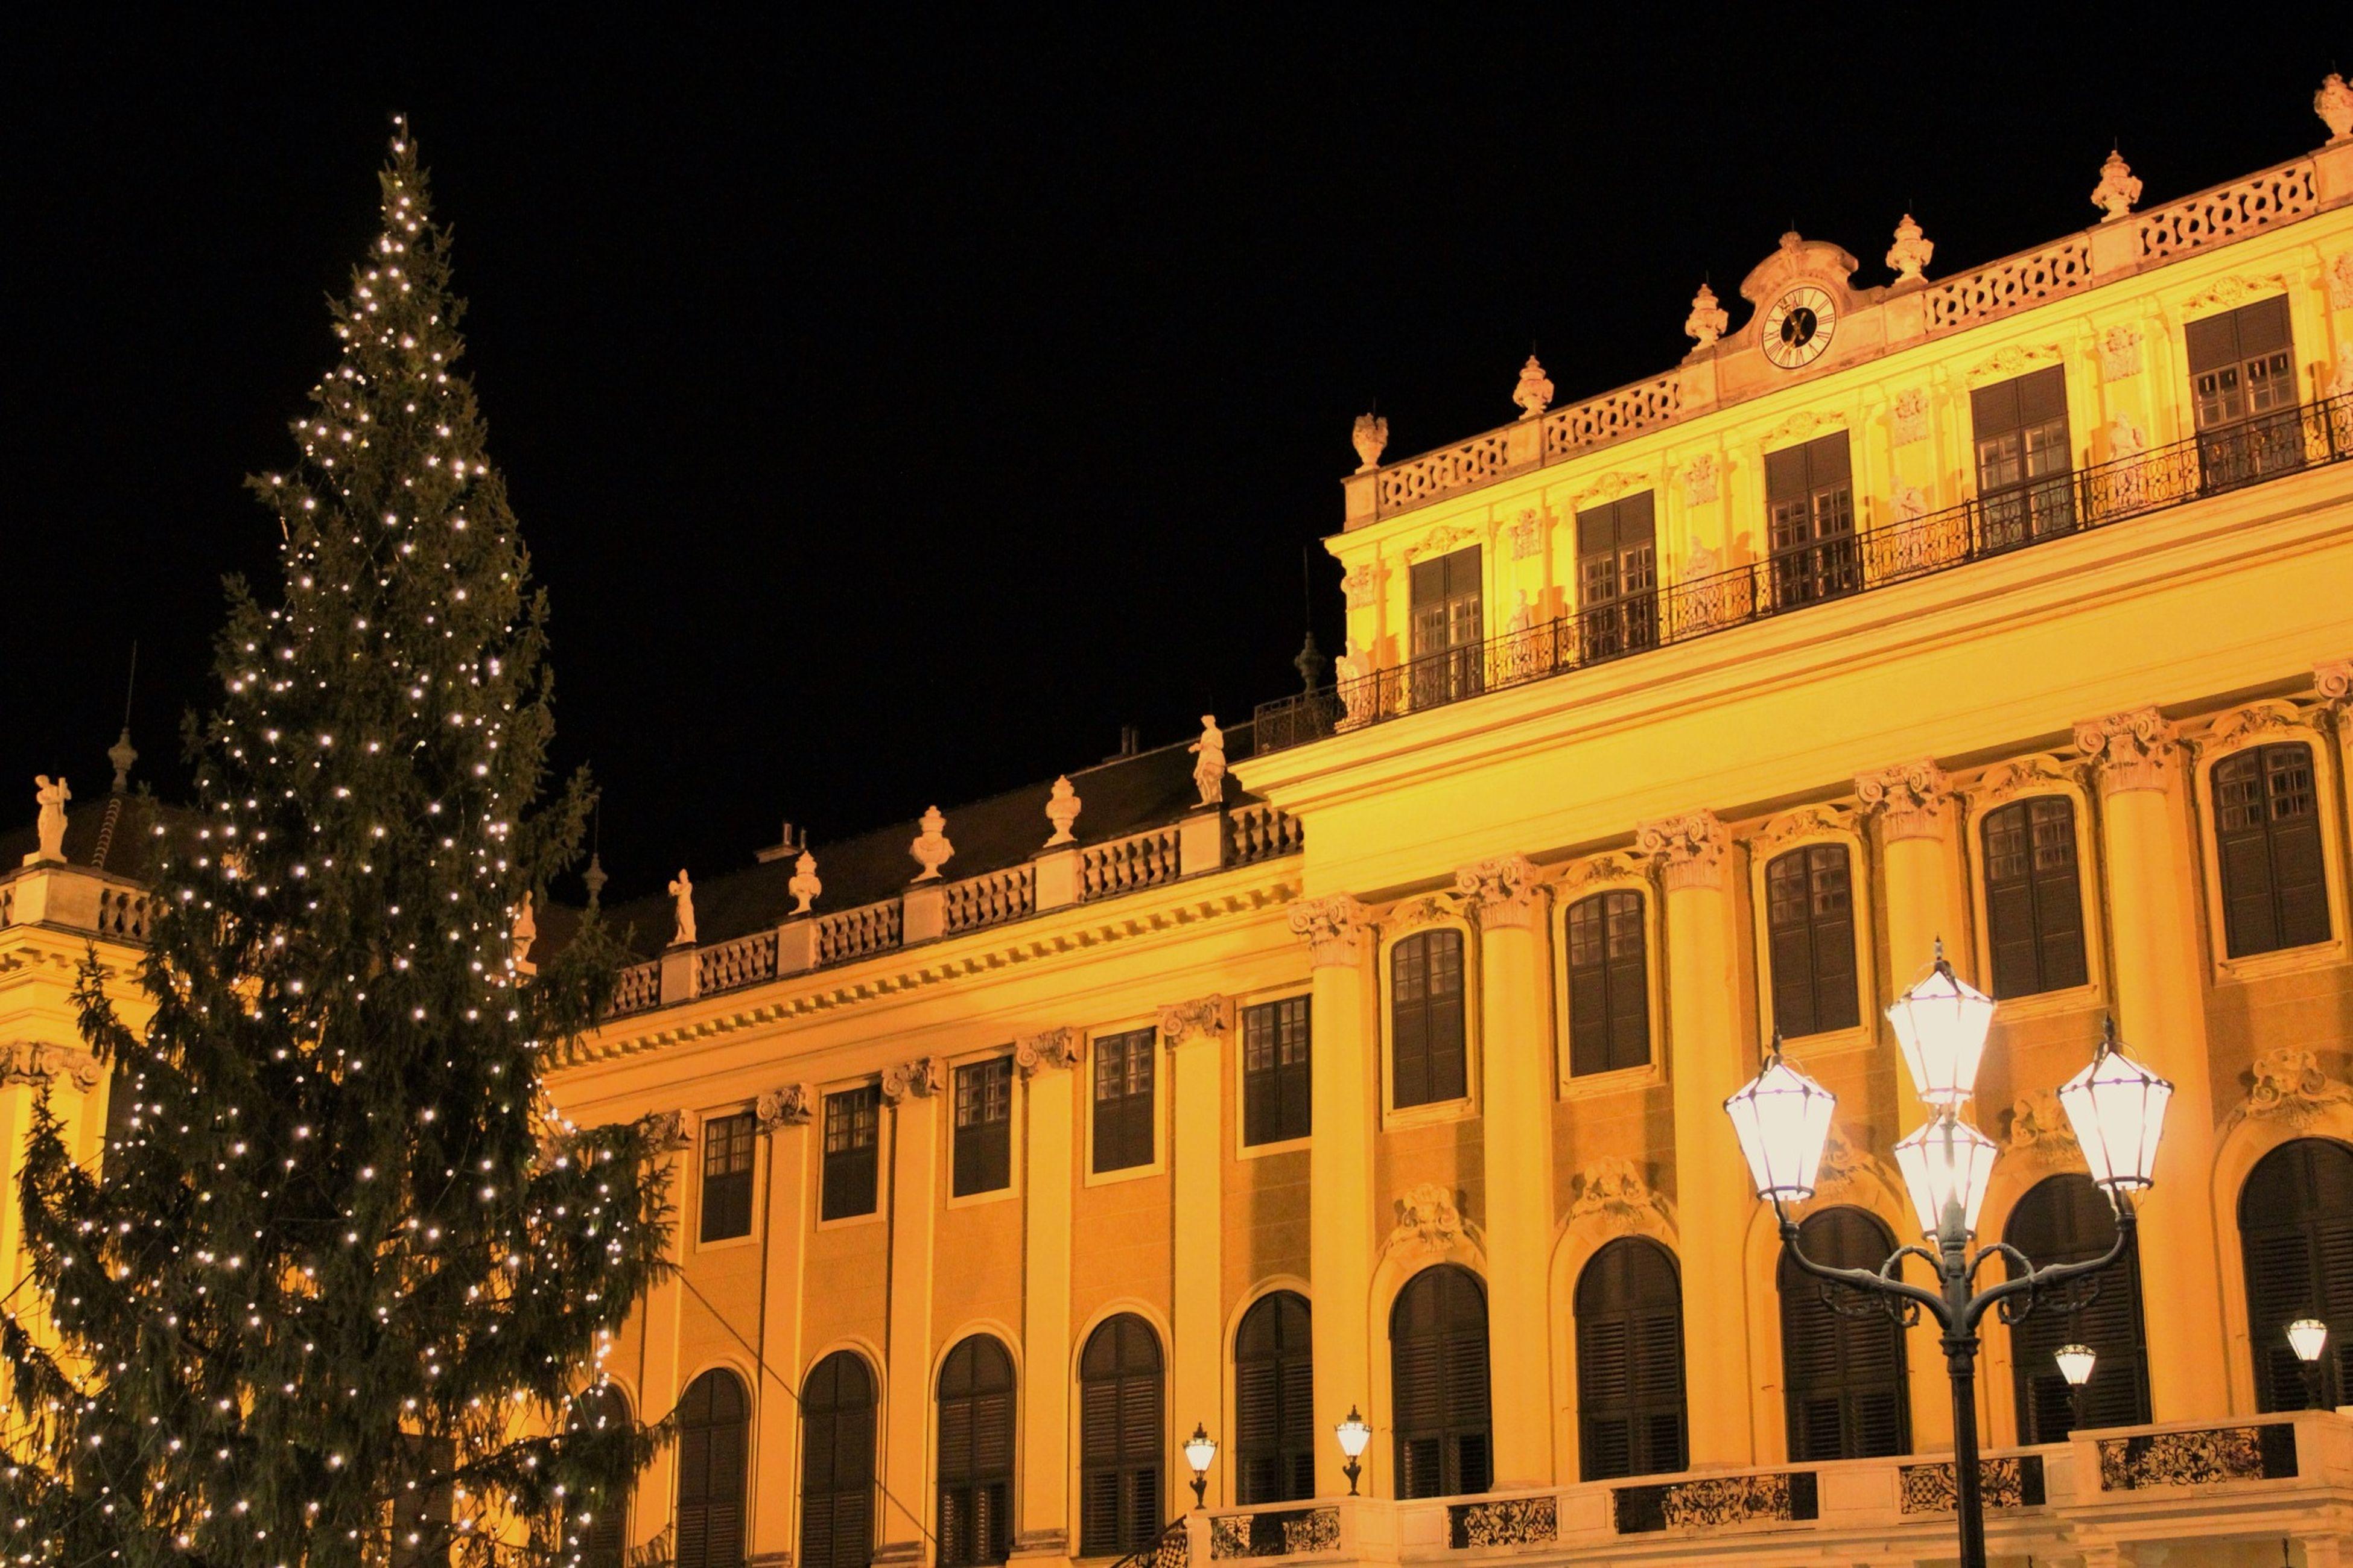 I wish you all Merry Christmas! Feliz Navidad! Frohe Weihnachten! Light Night Lights Night Christmas Christmas Tree Christmas Lights EyeEm Best Shots EyeEm Best Edits Eyem Best Shots